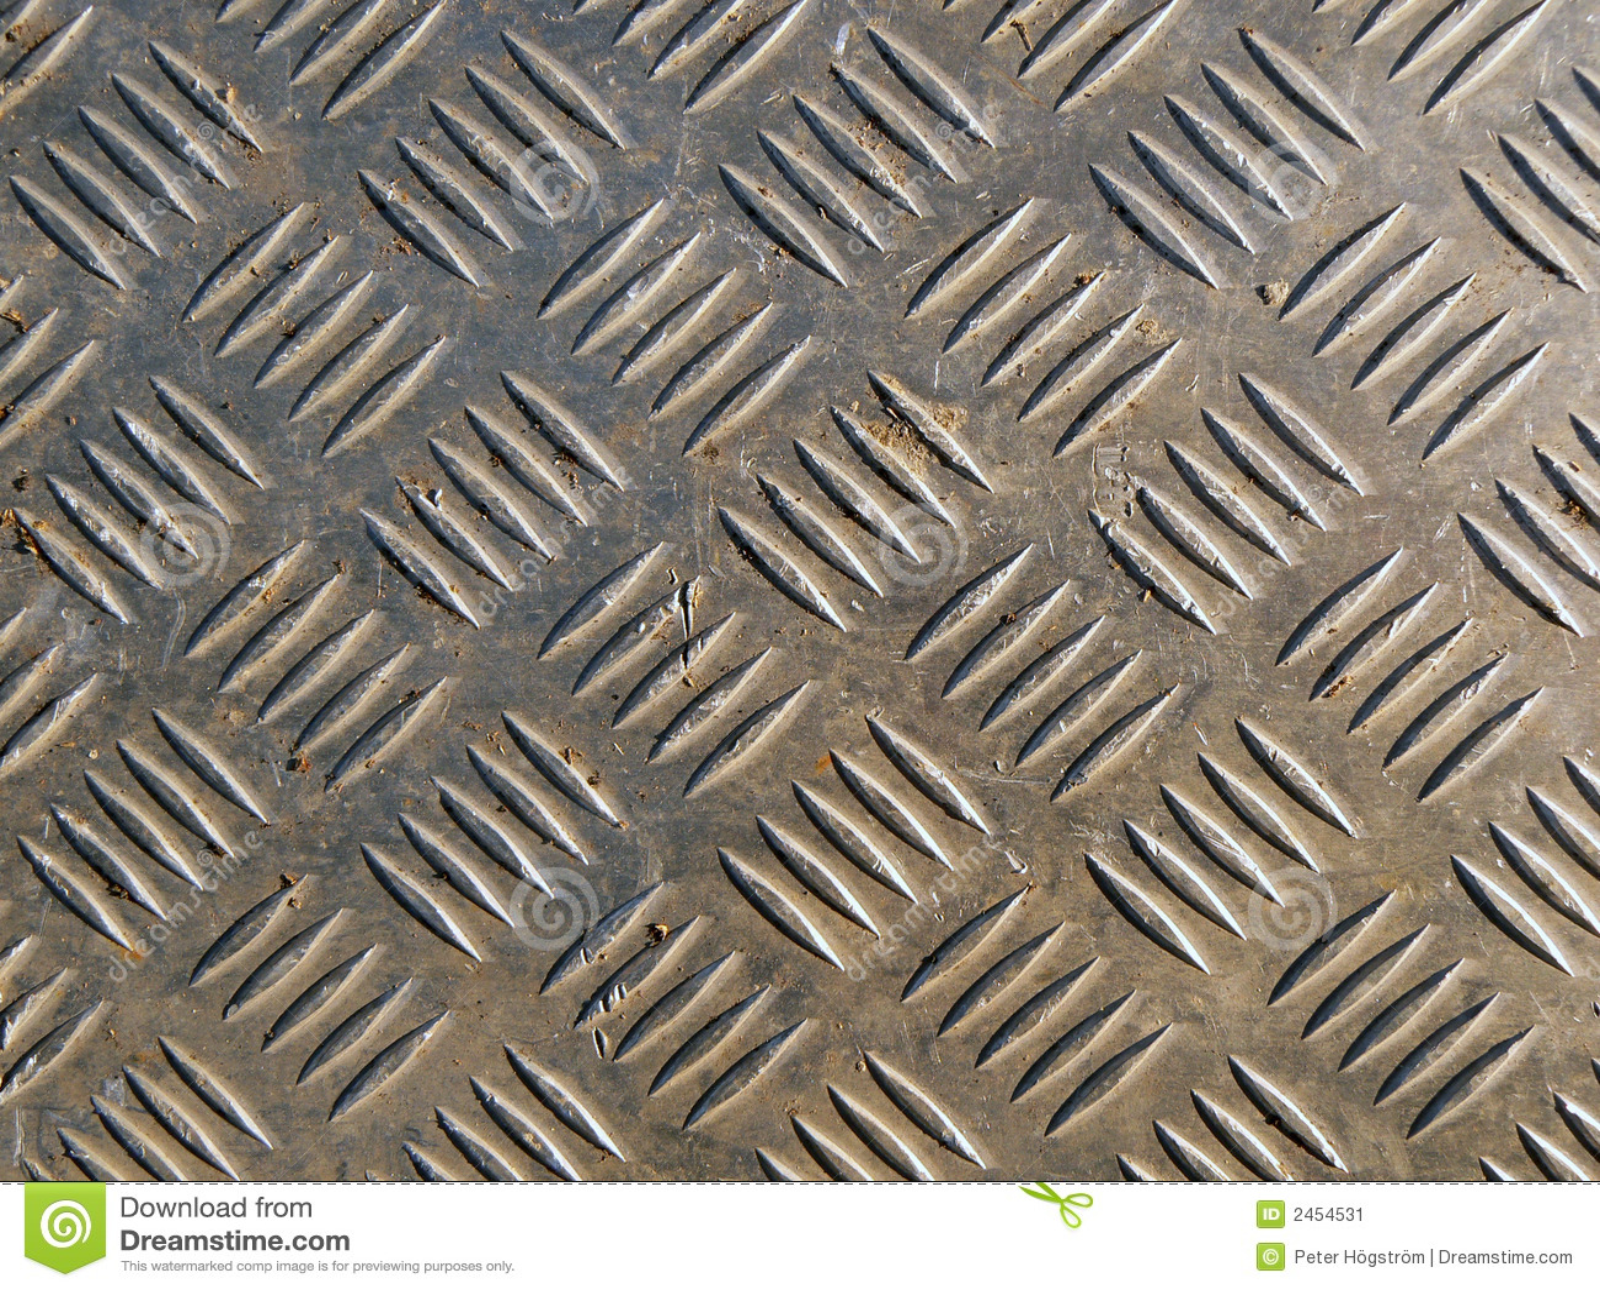 fond plaqu par m tal image stock image du texturis 2454531. Black Bedroom Furniture Sets. Home Design Ideas